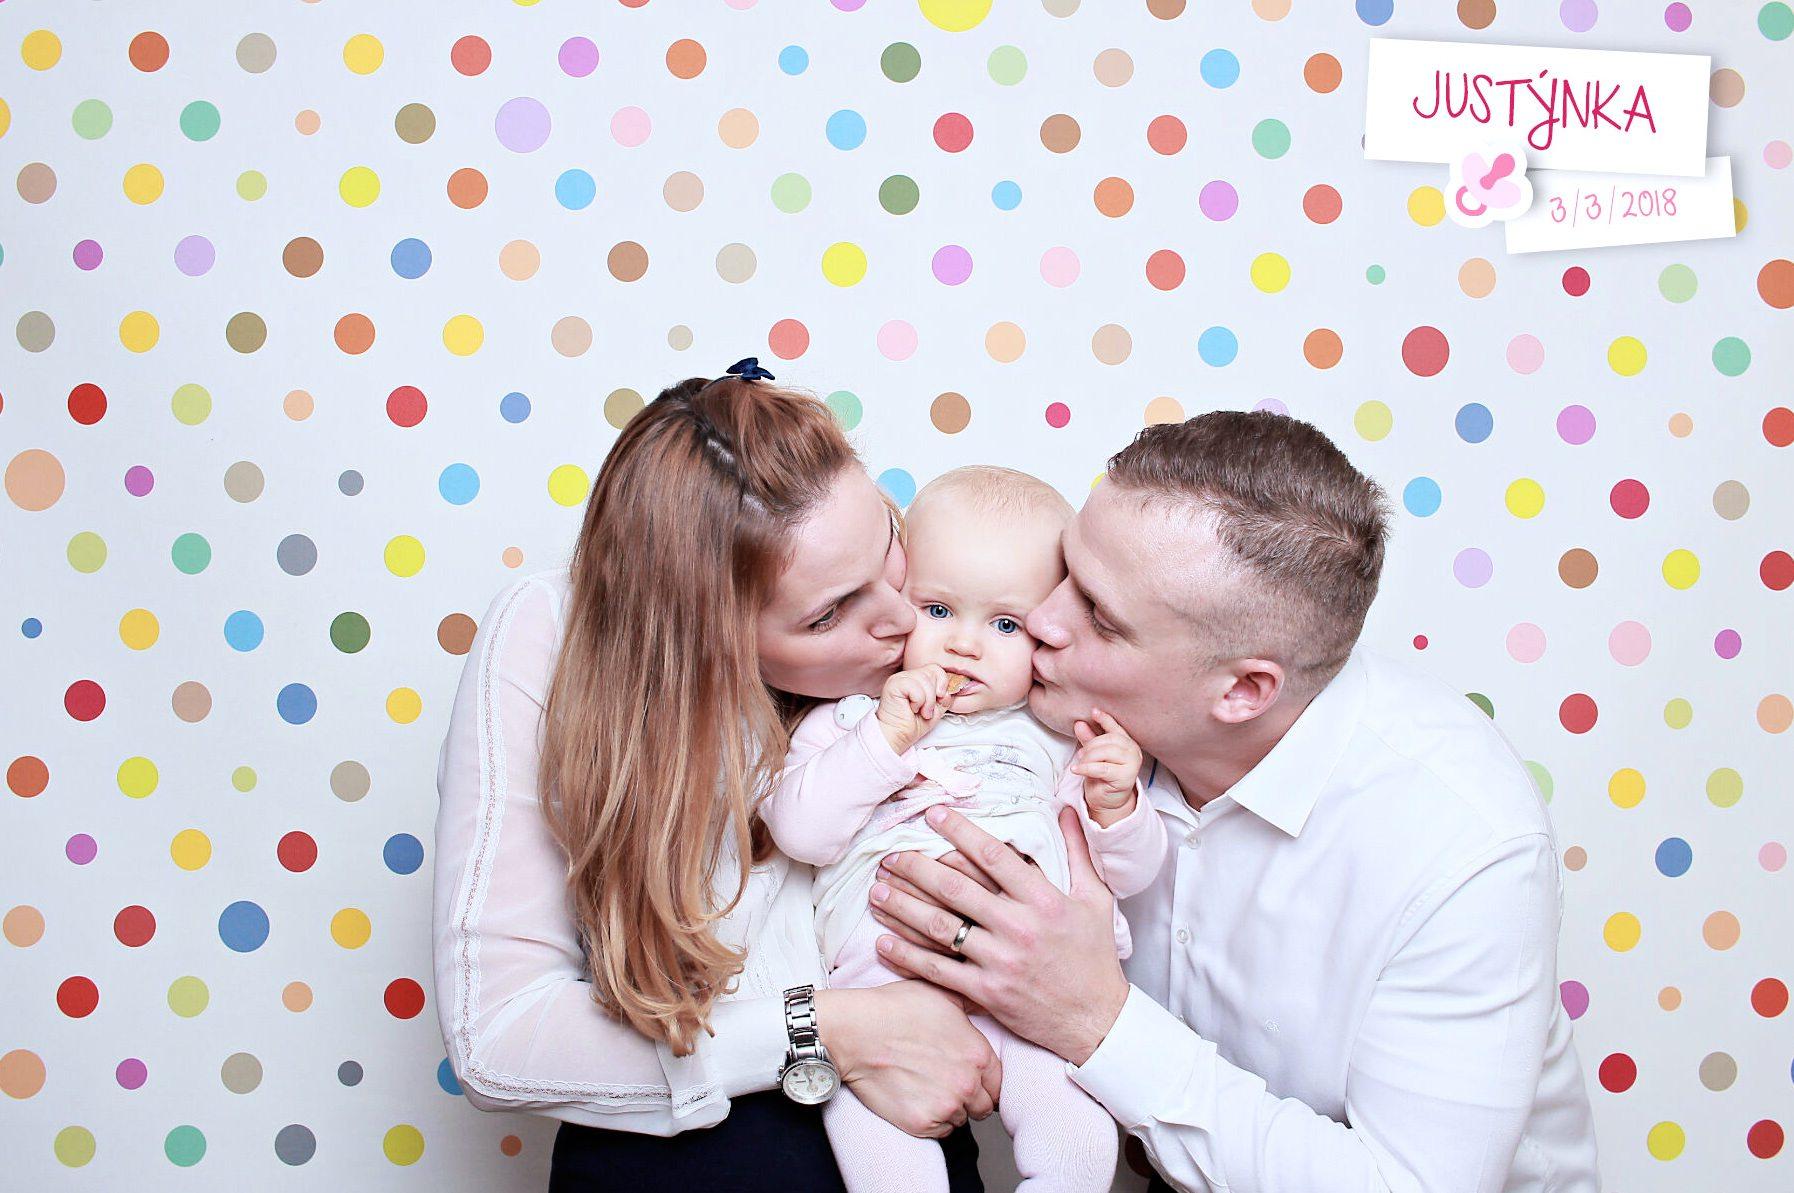 fotokoutek-justynka-3-3-2018-397775